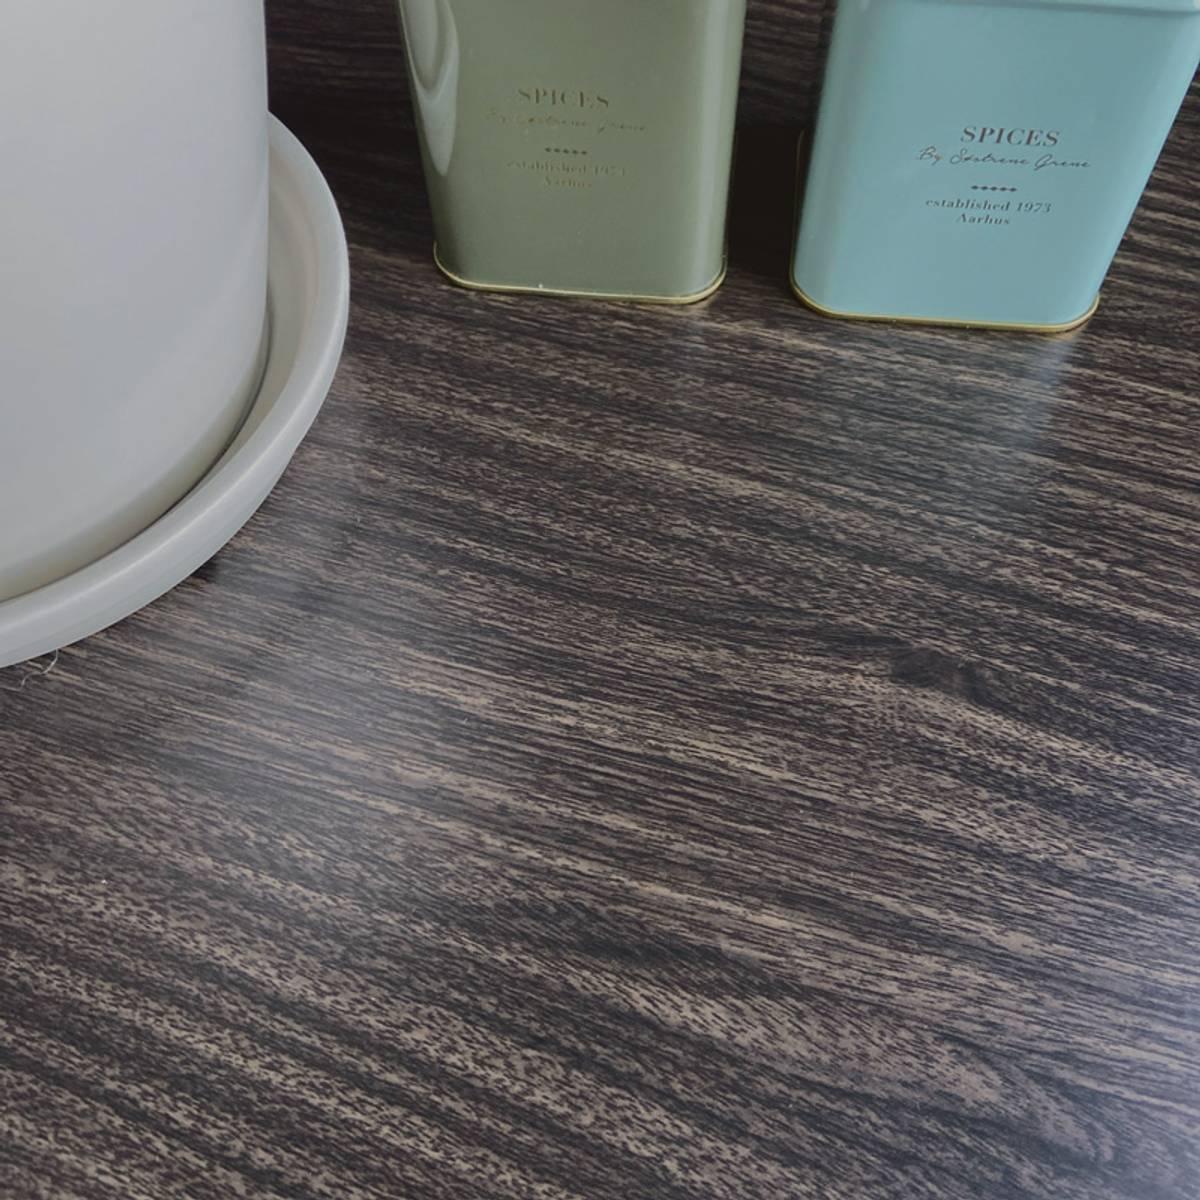 Vareprøve: Dark ash kontaktplast